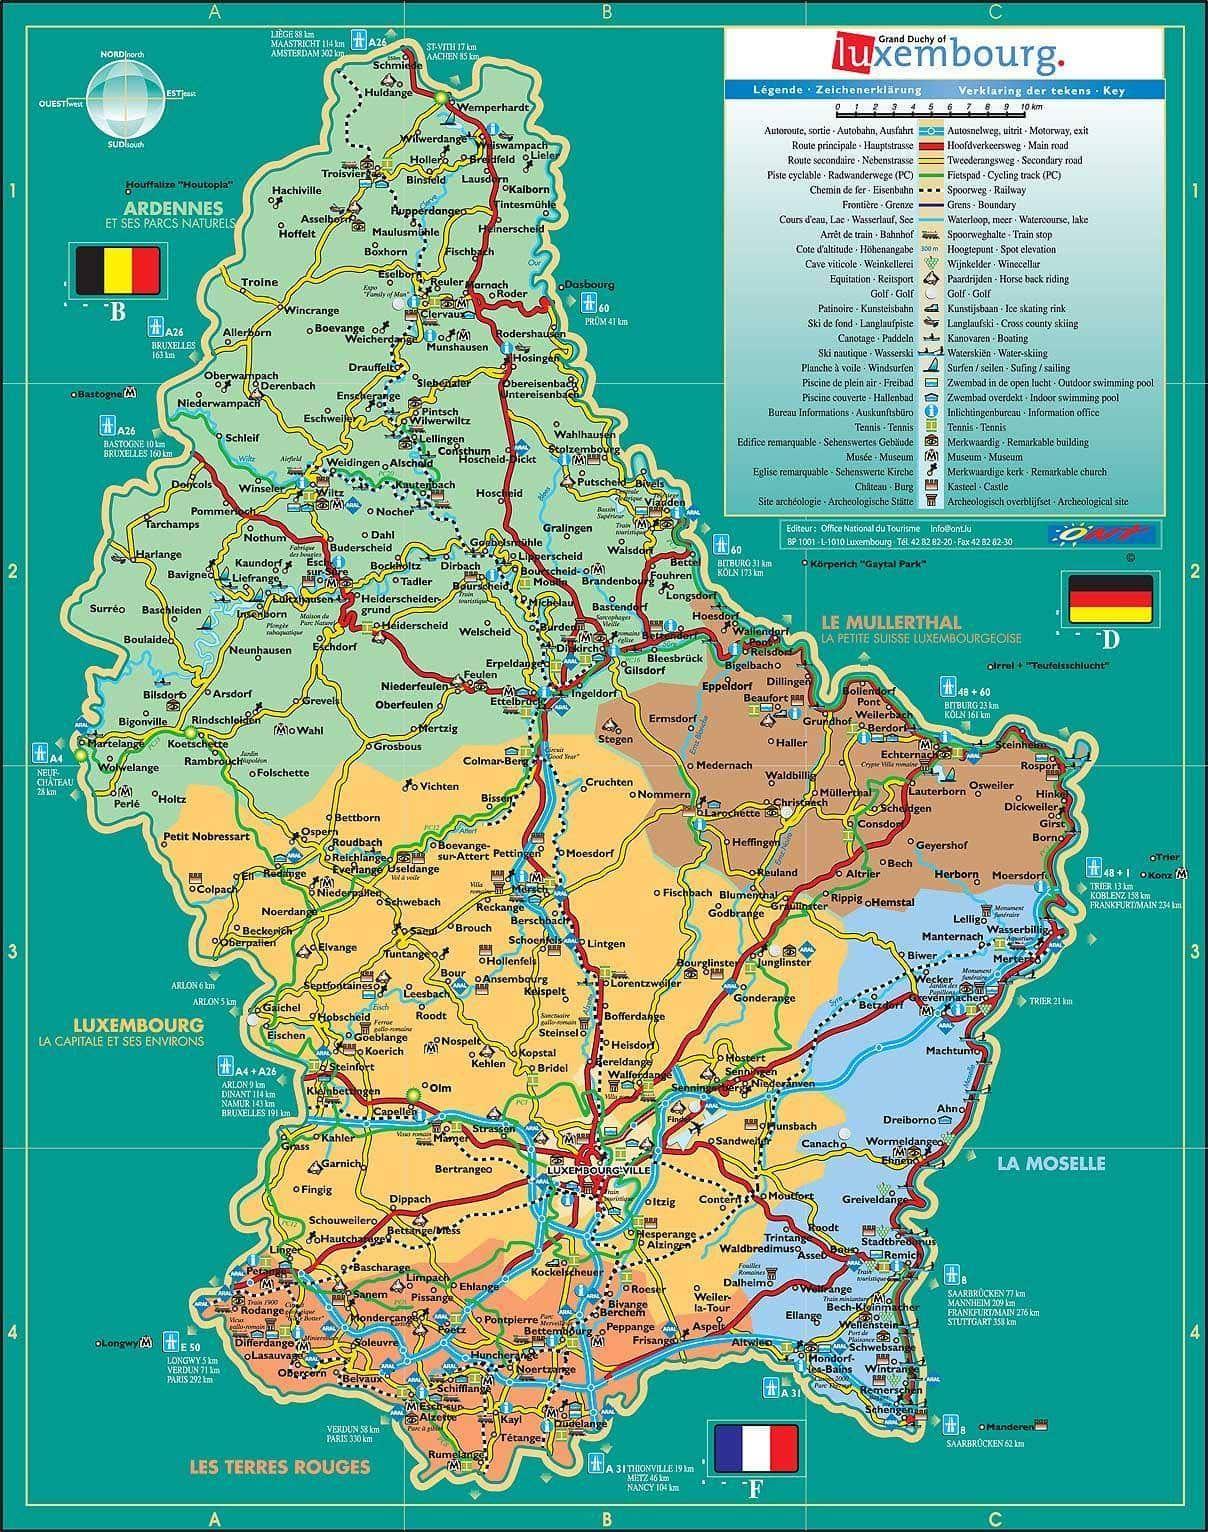 lussemburgo_mappa